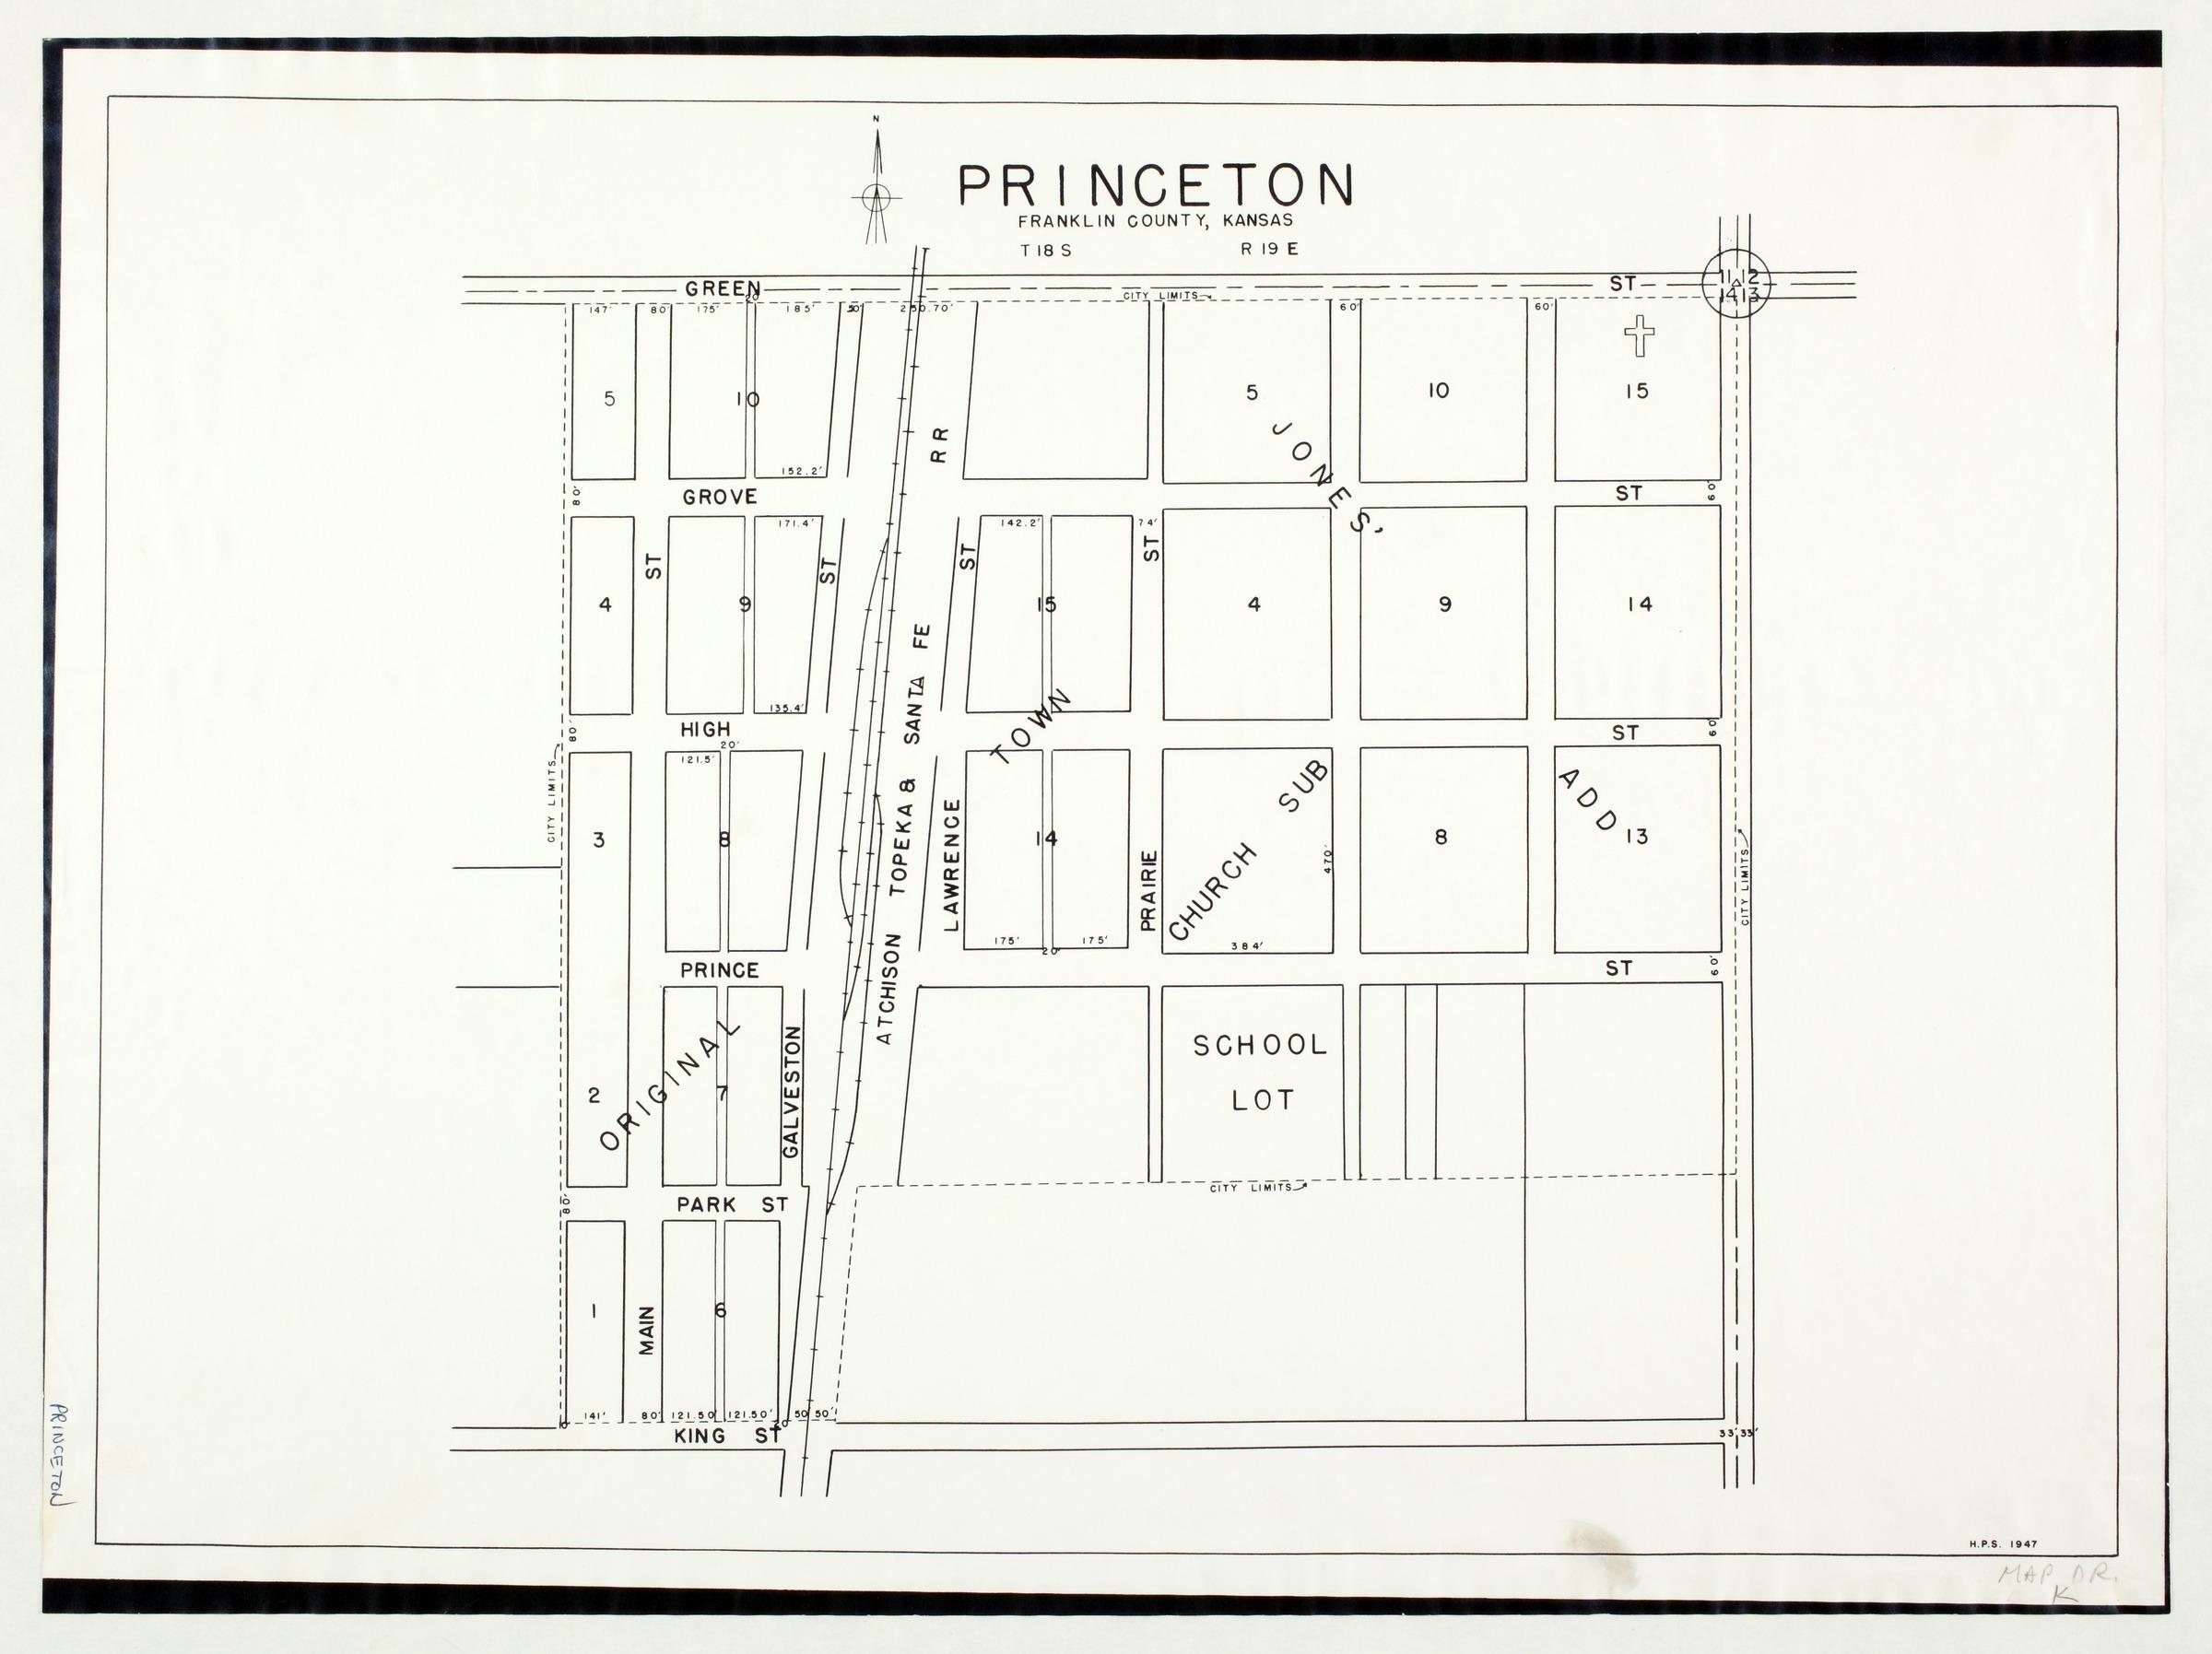 Princeton, Franklin County, Kansas